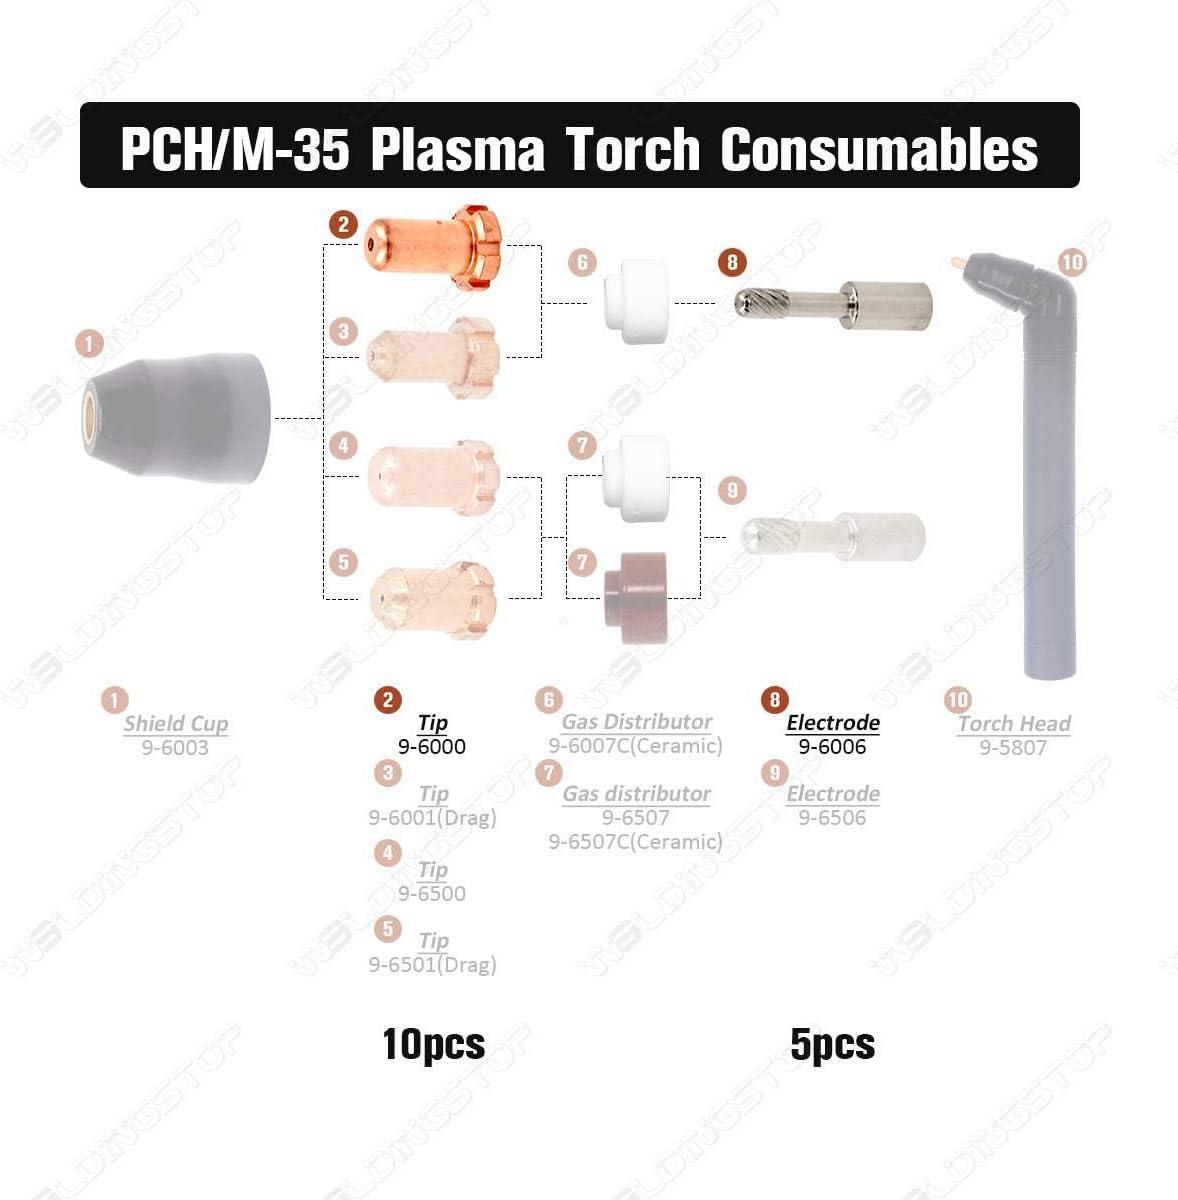 NEW Thermal Dynamics Plasma tip 9-6502